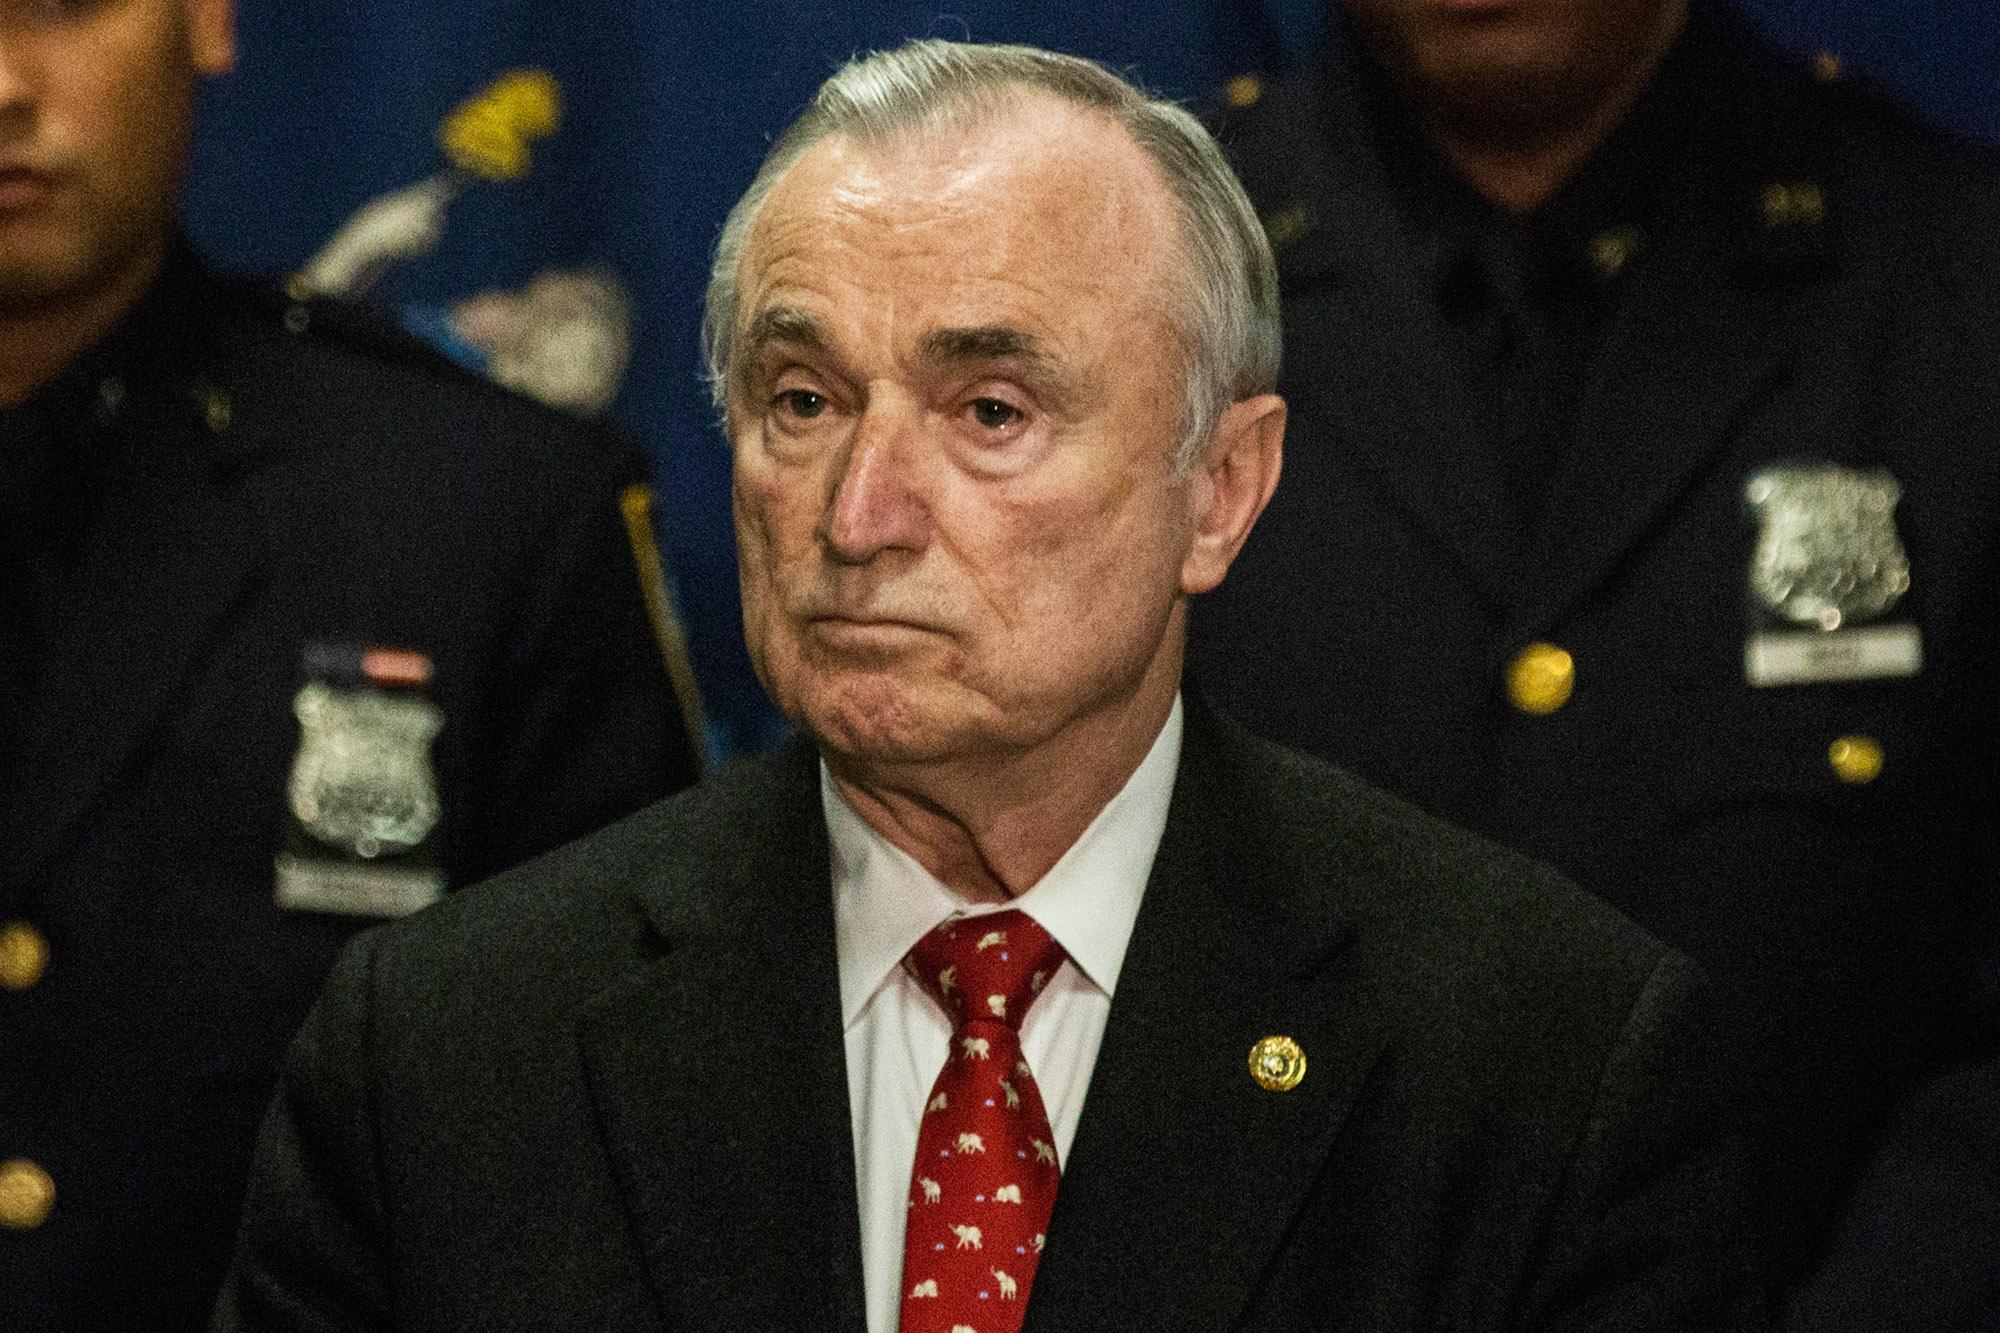 NYC Police Commissioner Bill Bratton Steps-Down